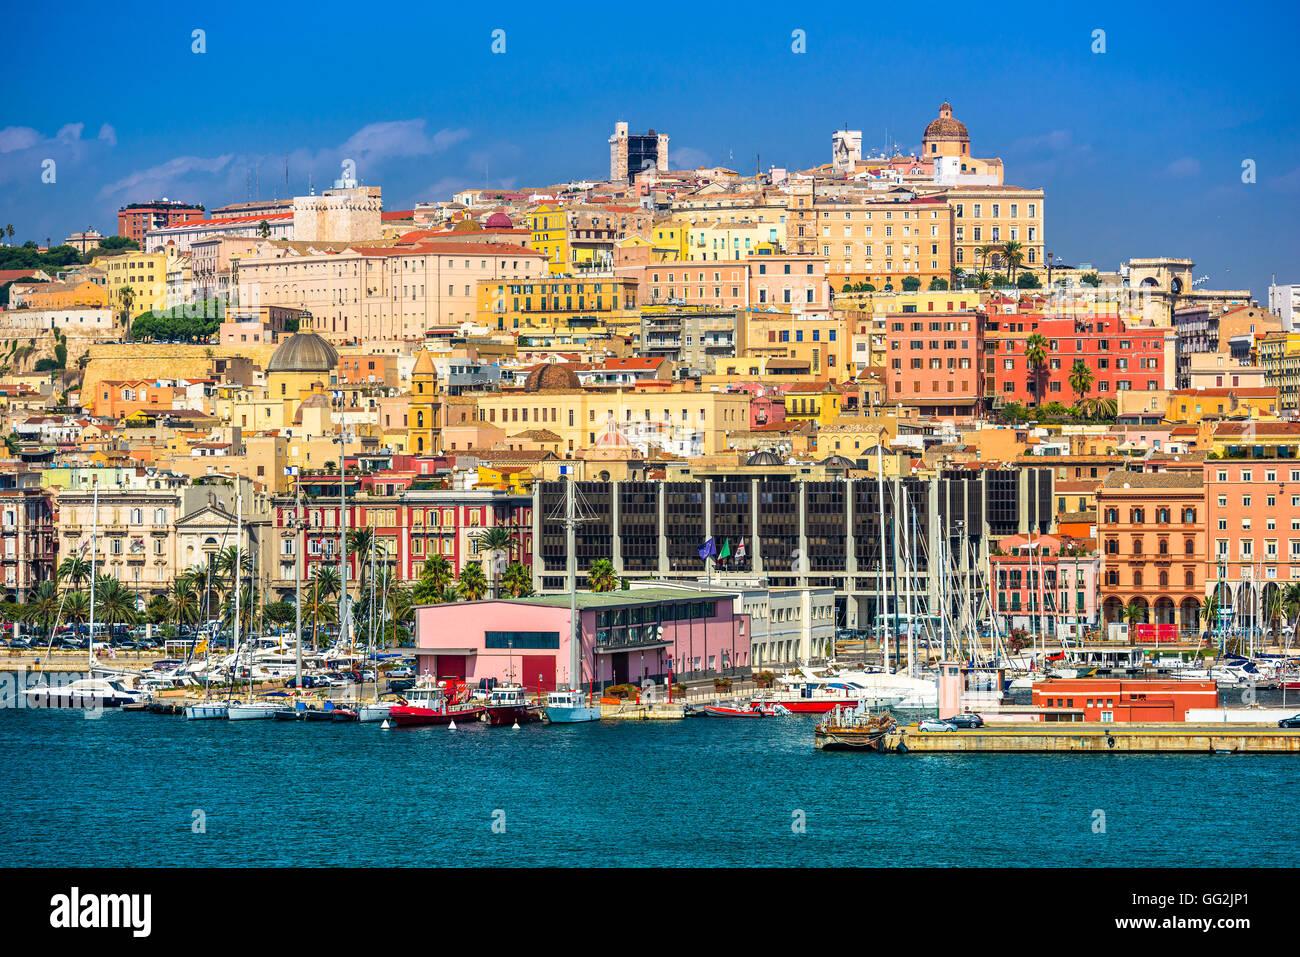 Cagliari, Sardinia, Italy coastal skyline on the Mediterranean Sea. - Stock Image